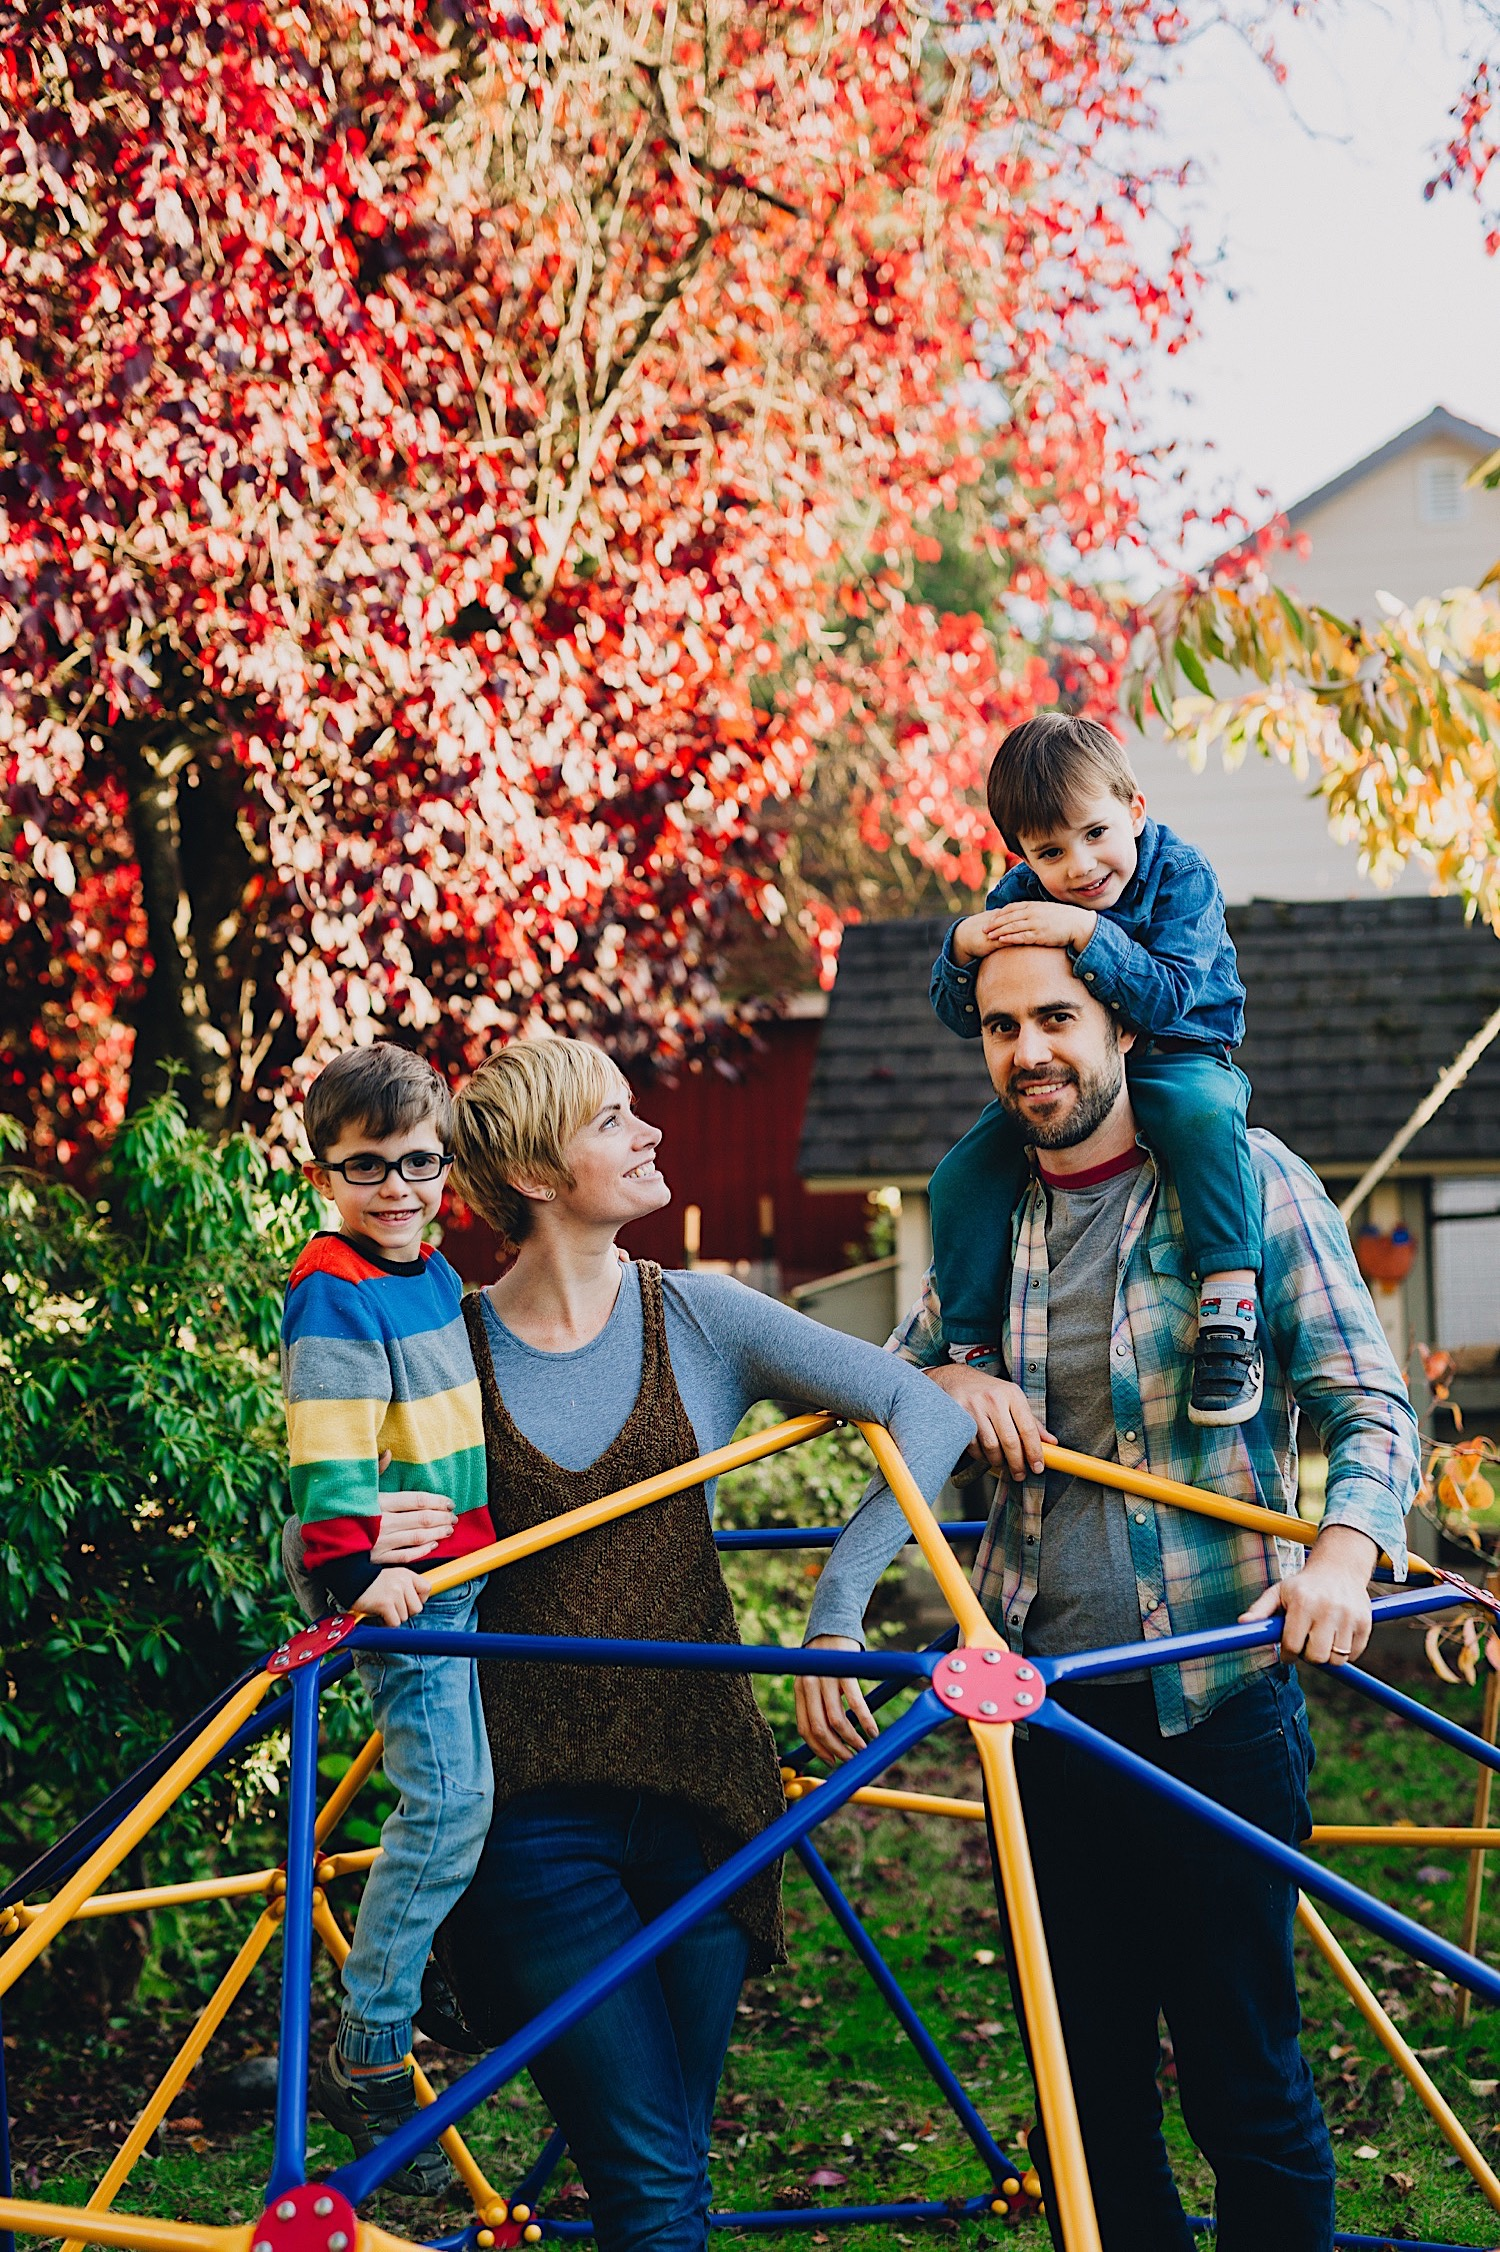 16_Photos_relaxed_Family_Fun_Photography_Seattle_Shoreline_documentary_Child.jpg